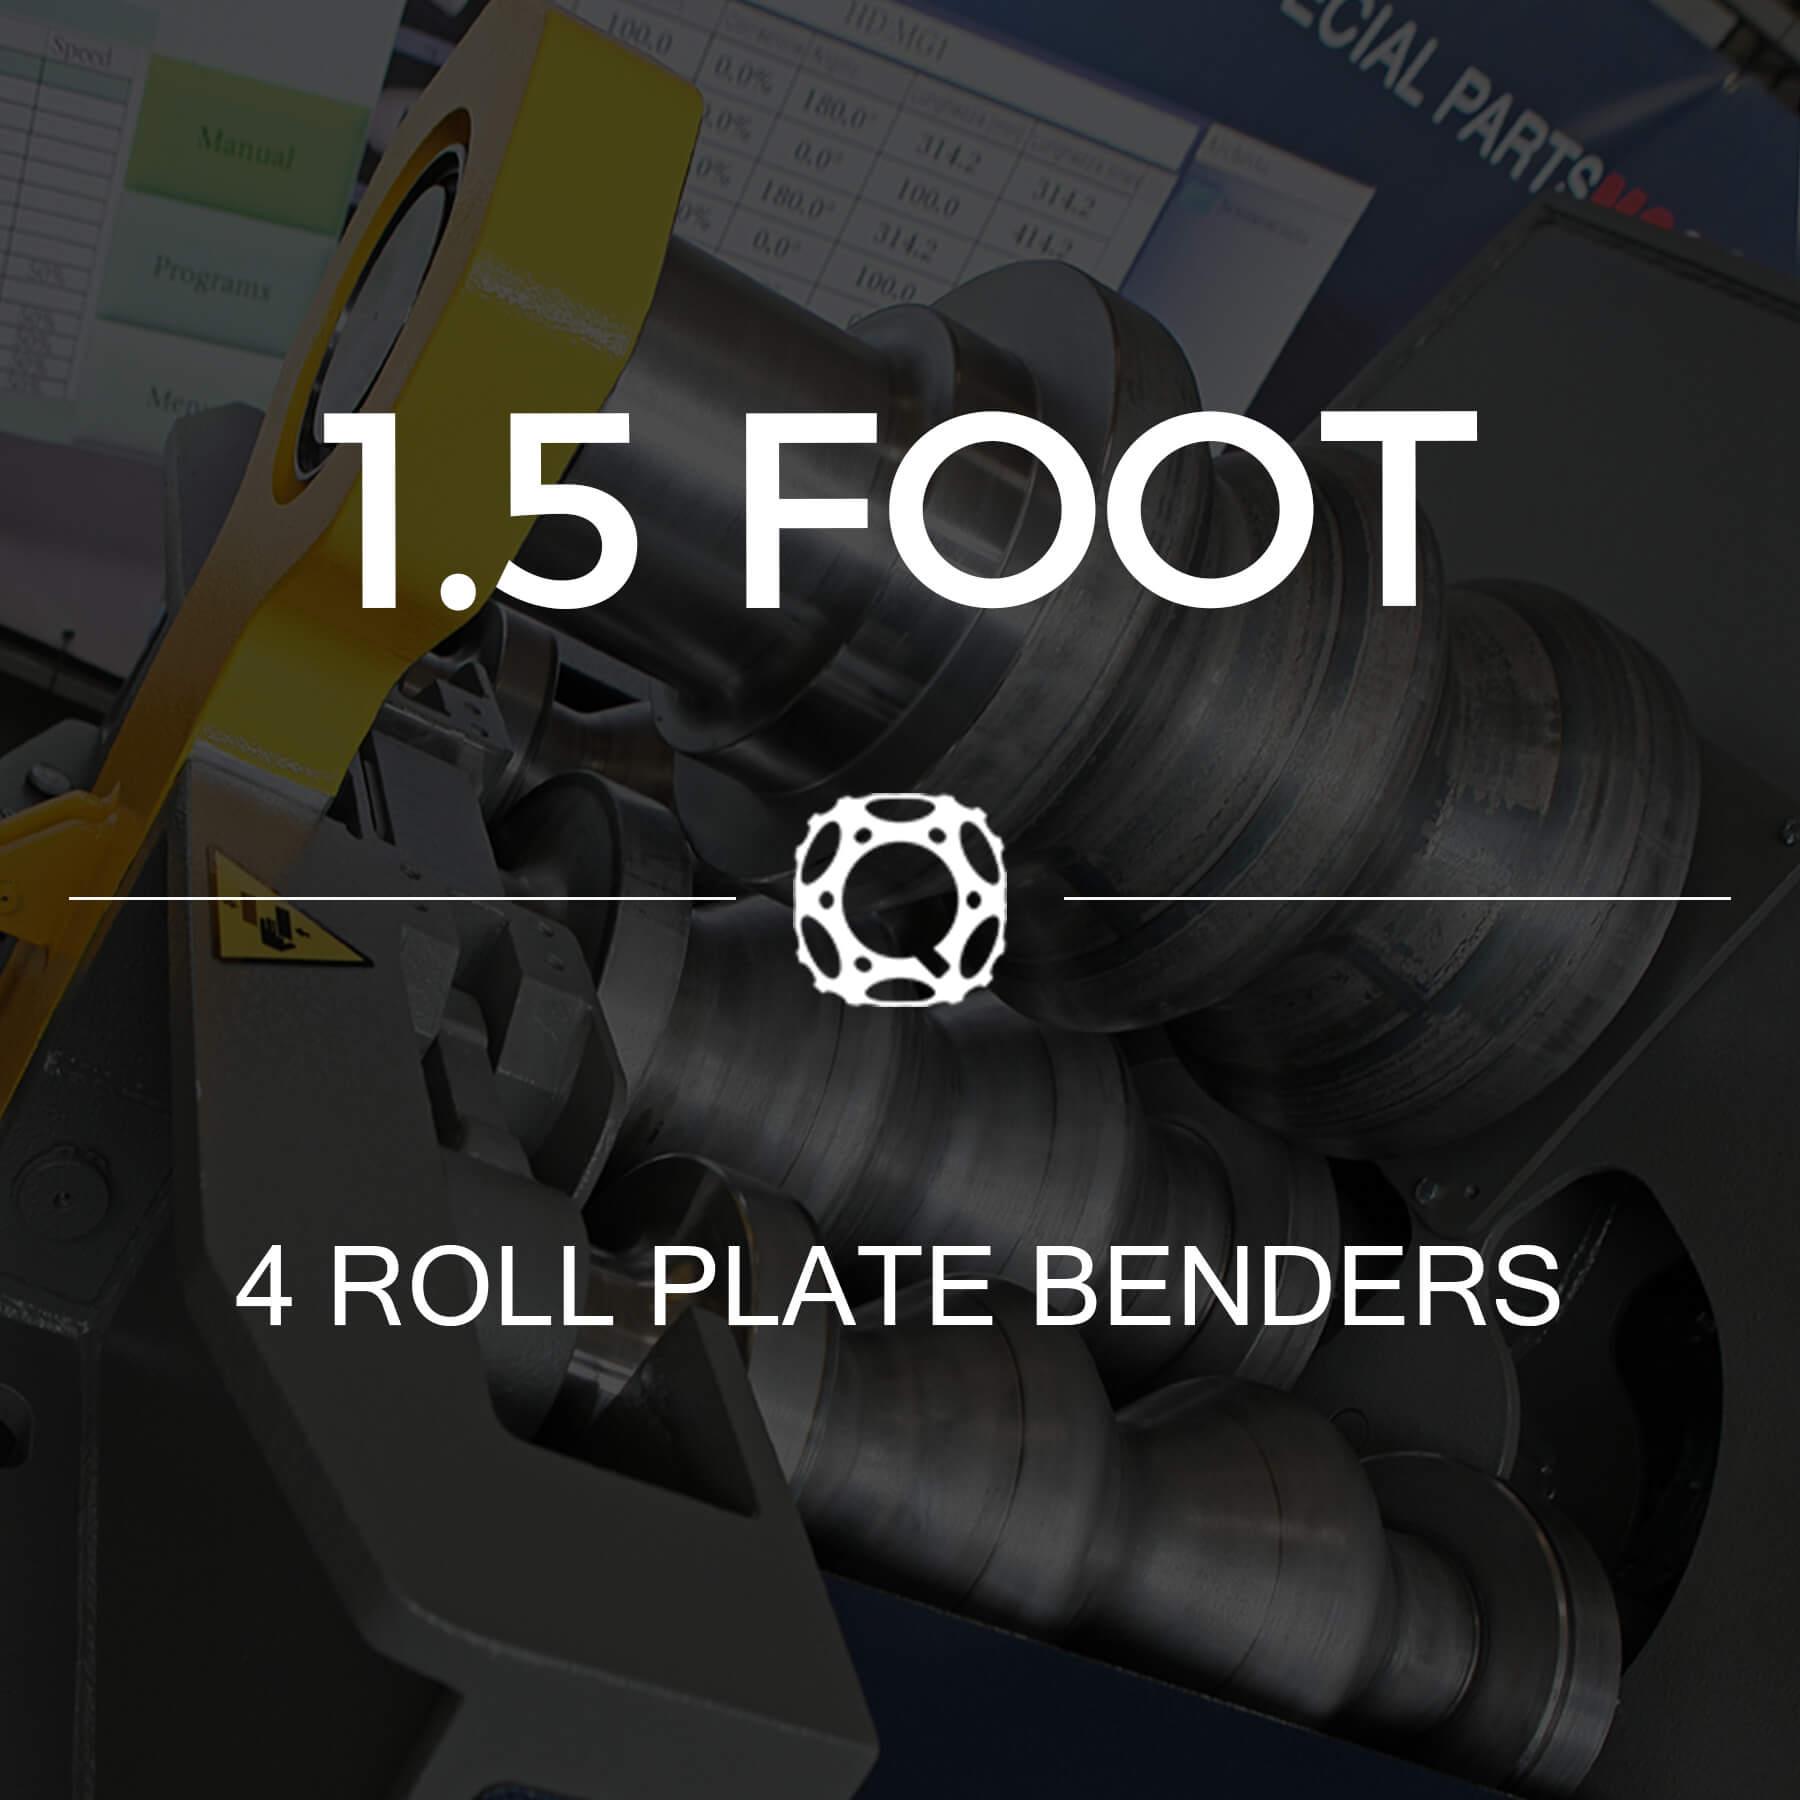 https://www.platebenders.com/4-rolls-working-lengths/1-foot-models-4-roll-plate-benders